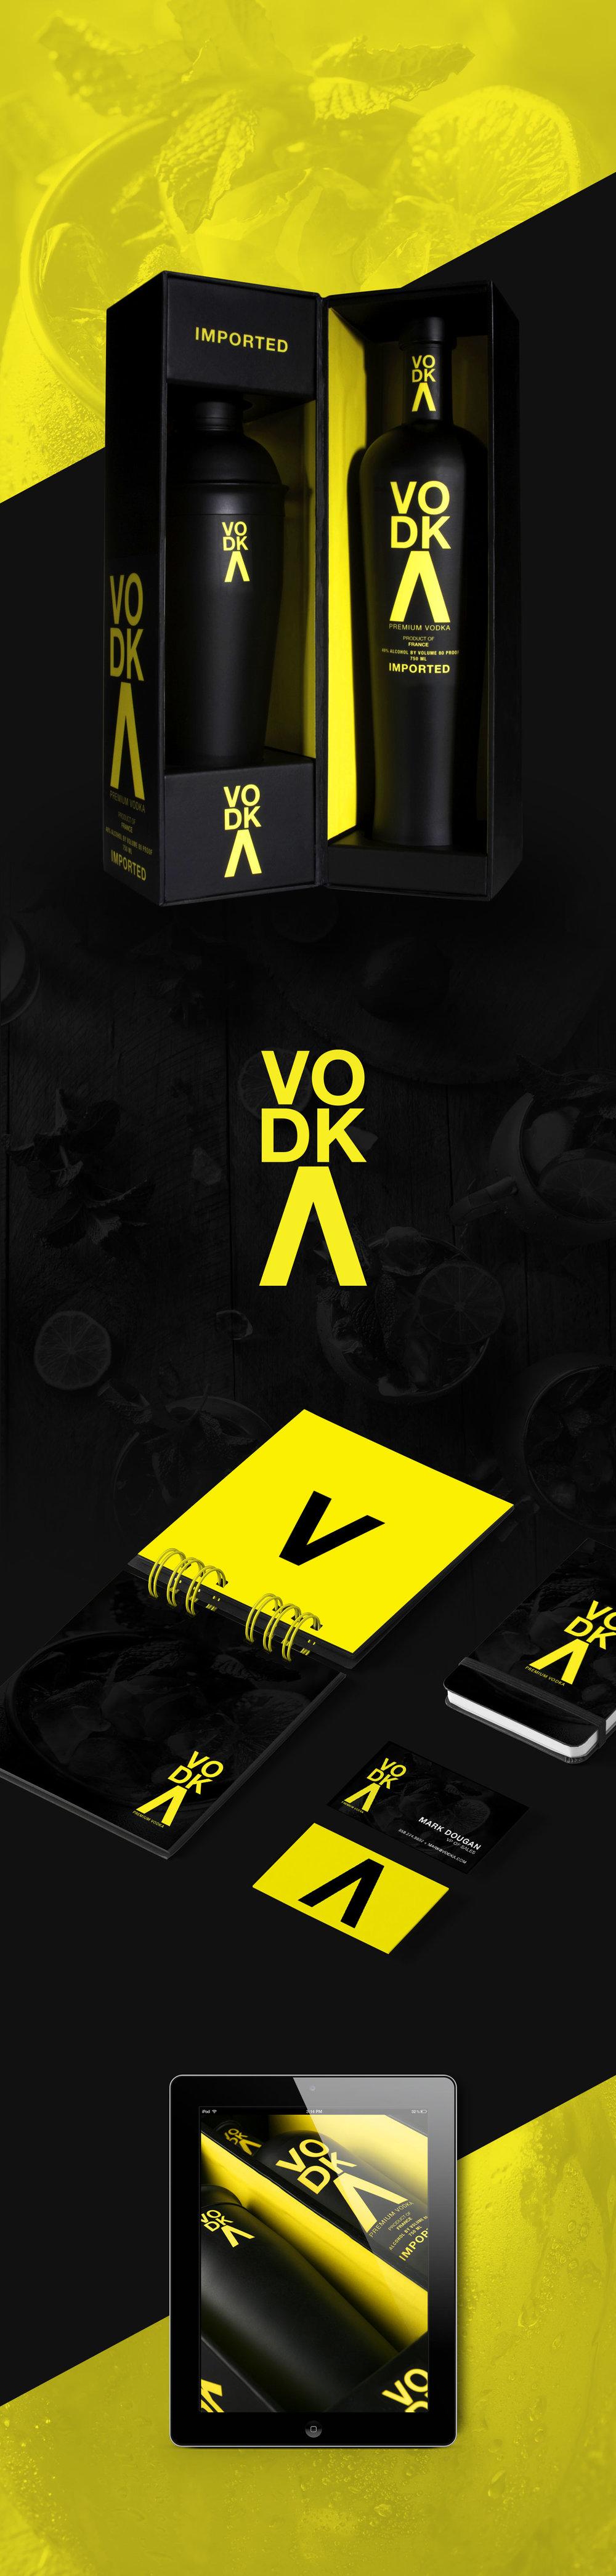 Projects_VODKA-2.jpg